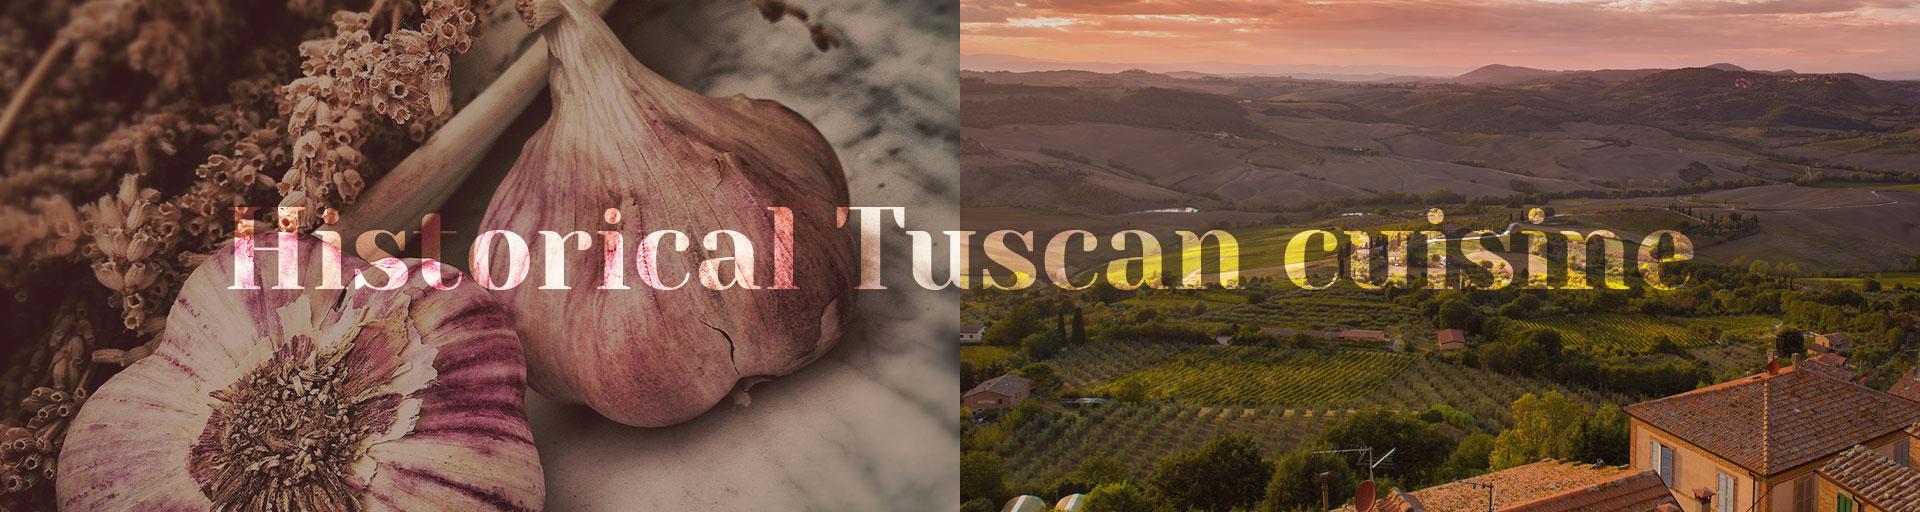 historical tuscan cuisine